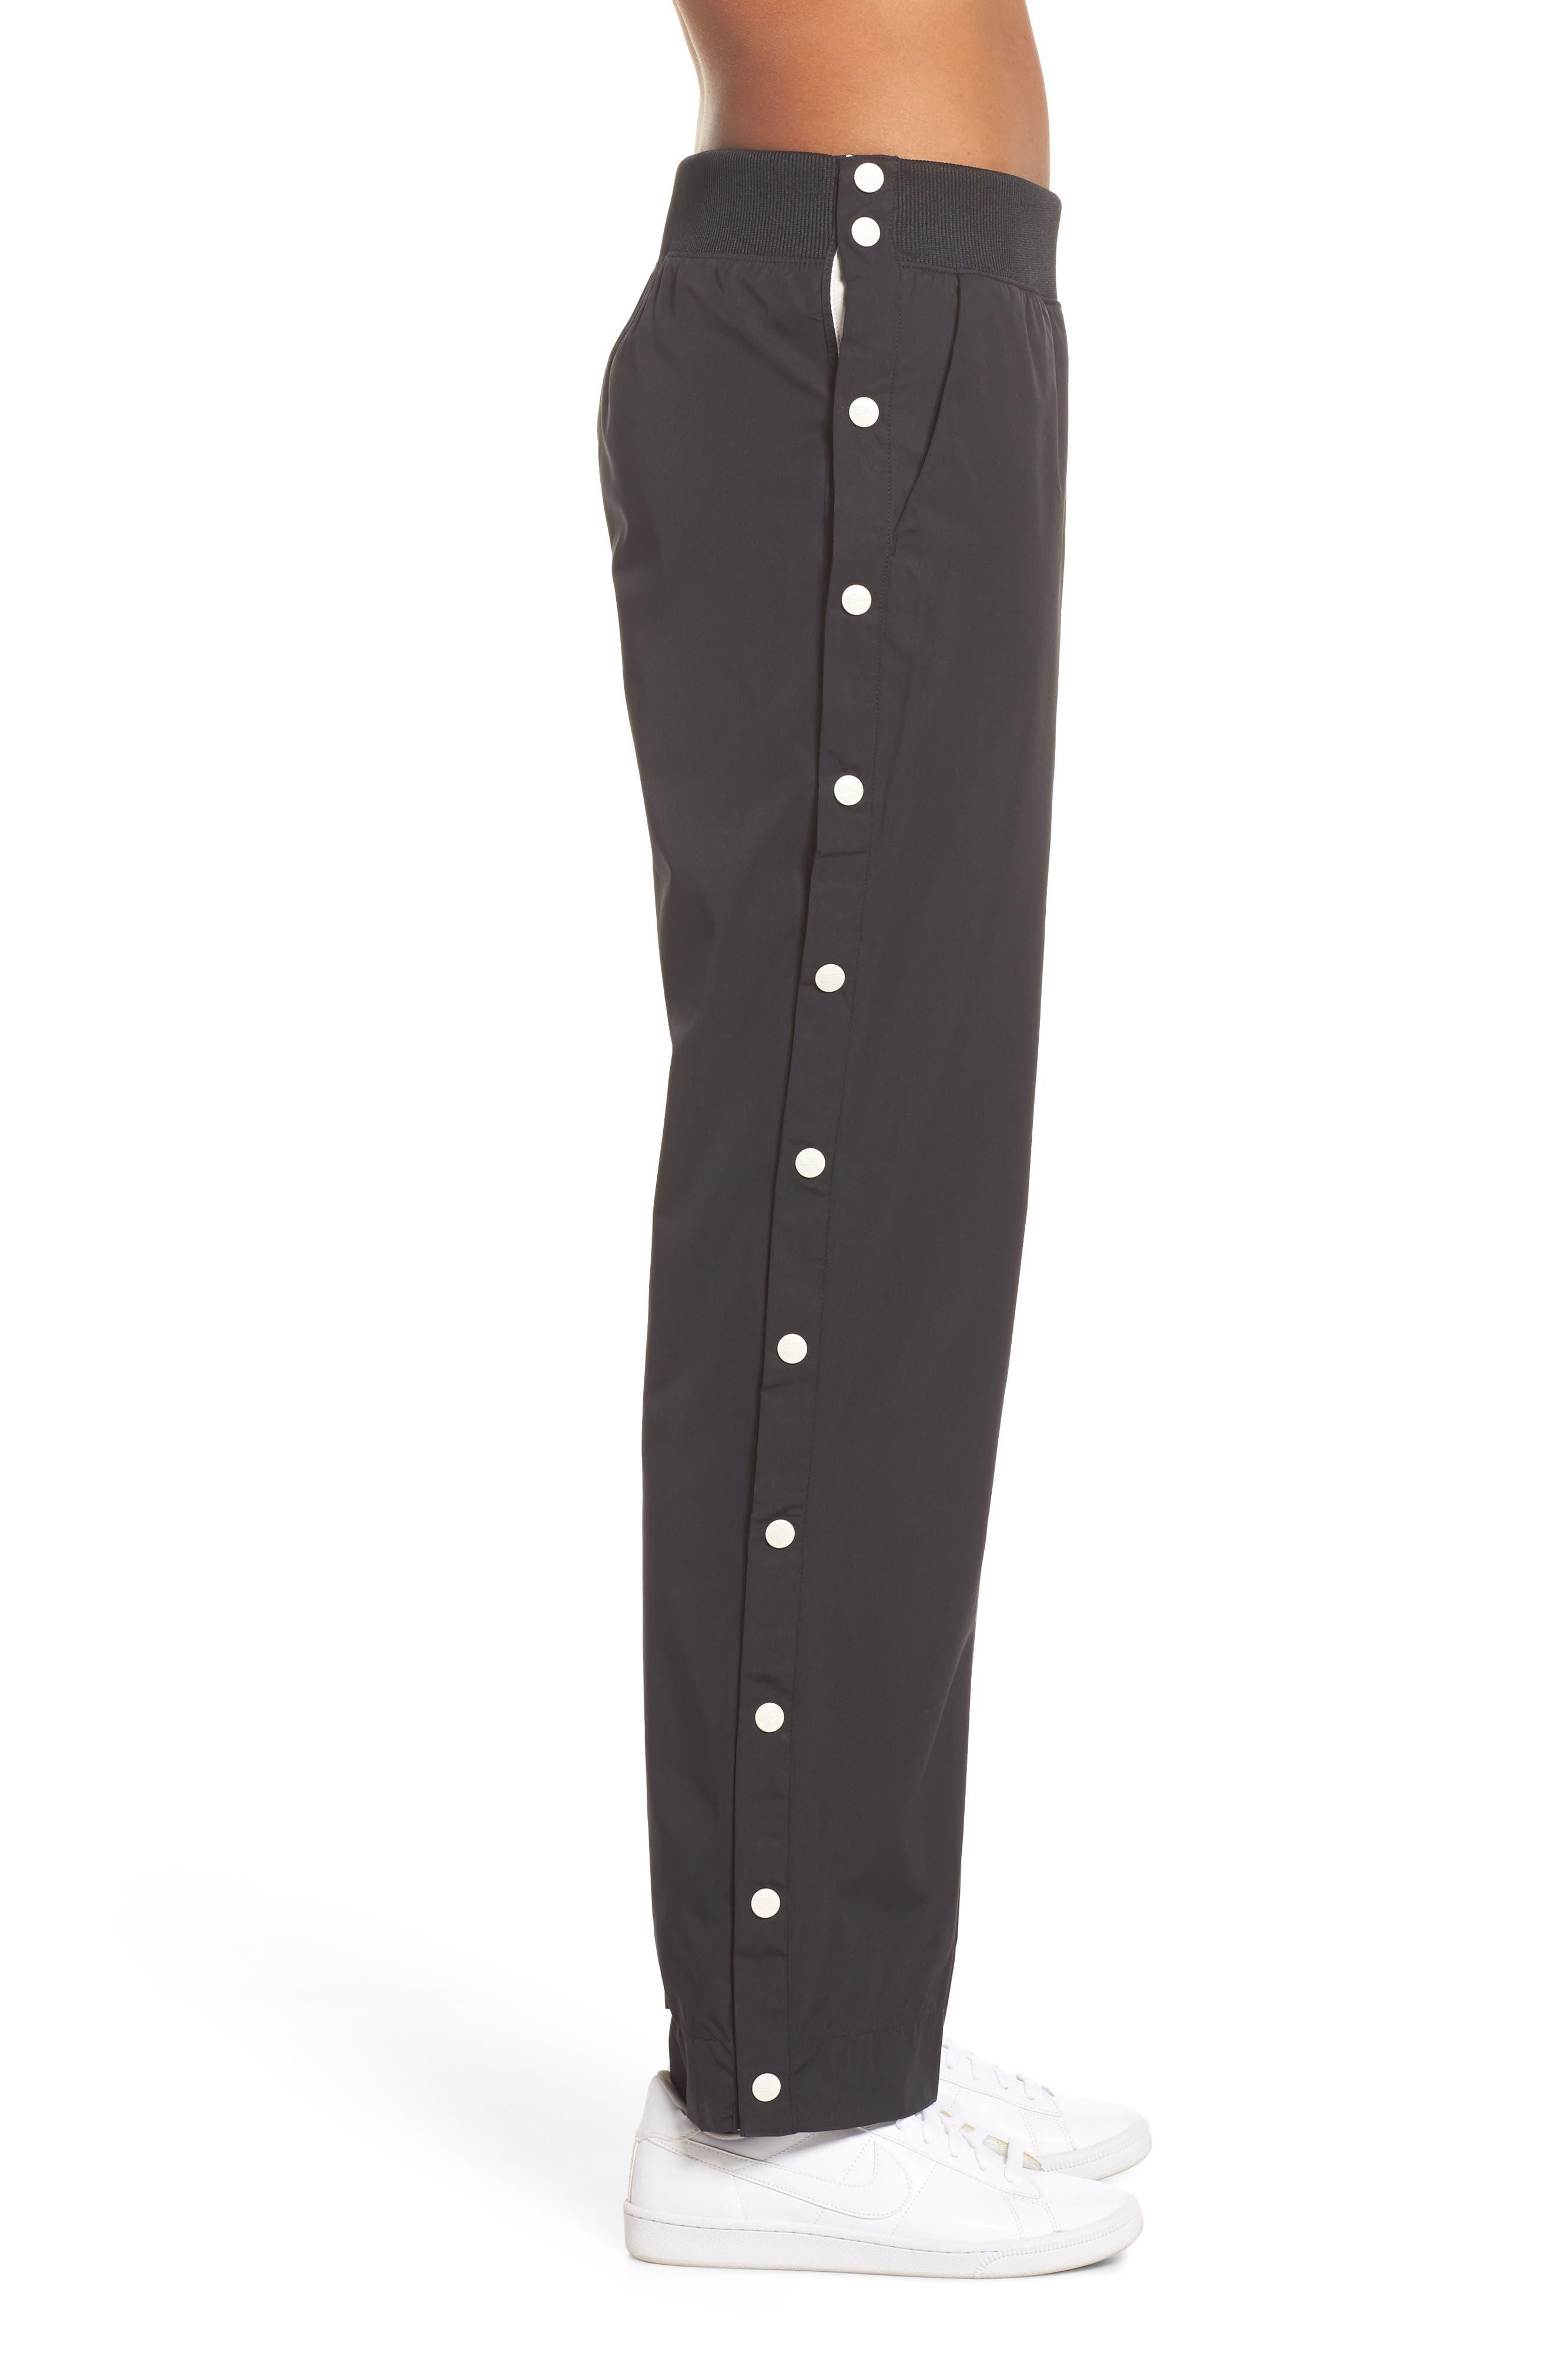 Sportswear Archive Snap Track Pants,                             Alternate thumbnail 3, color,                             Black/ Sail